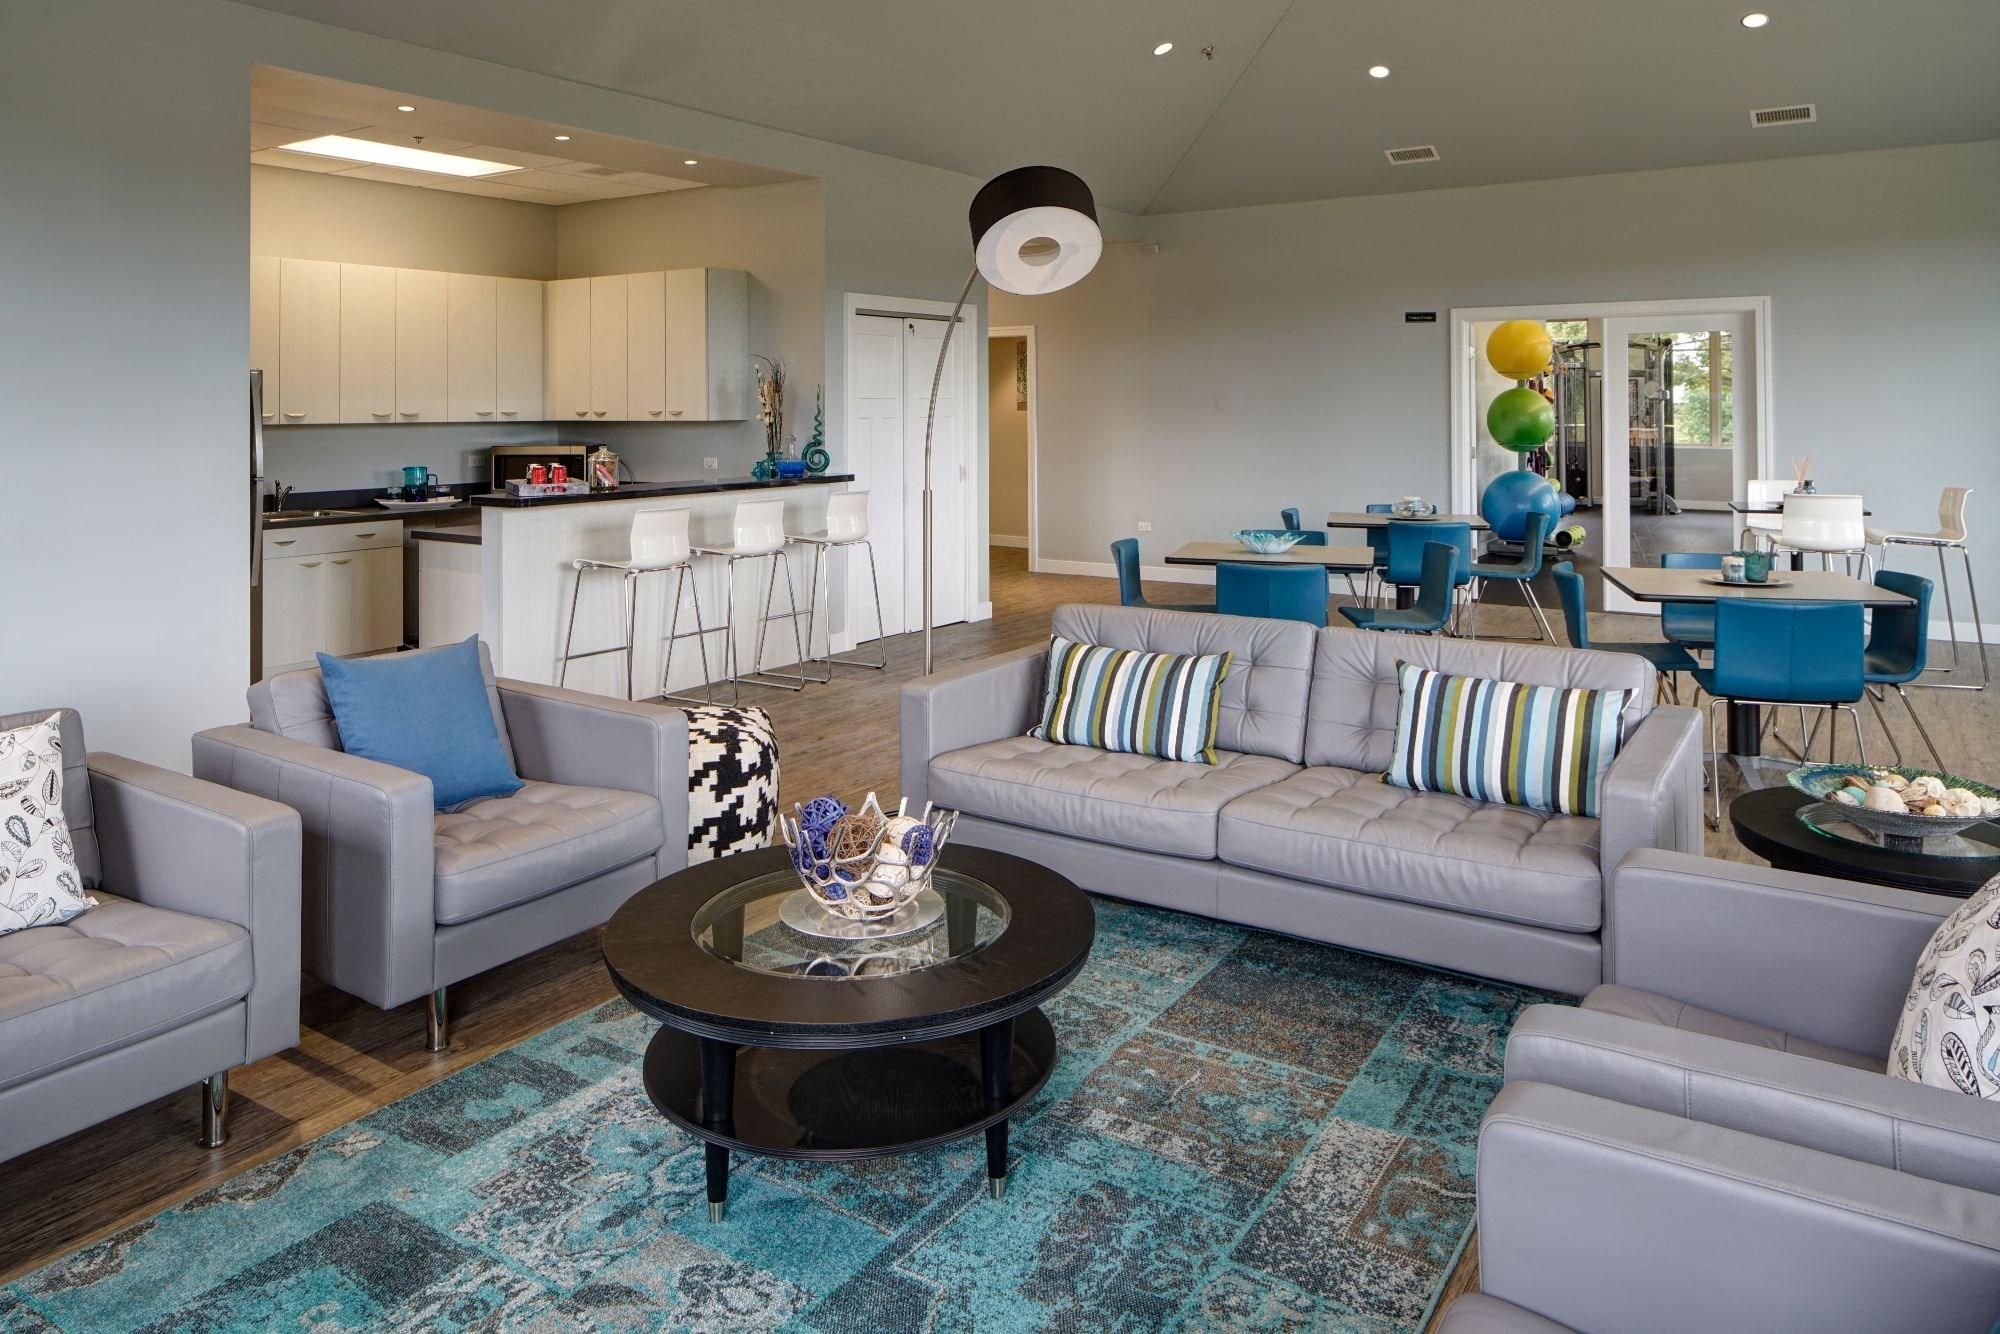 Luxurious Apartment Living, at Eagle Creek Apartments, Westmont Illinois